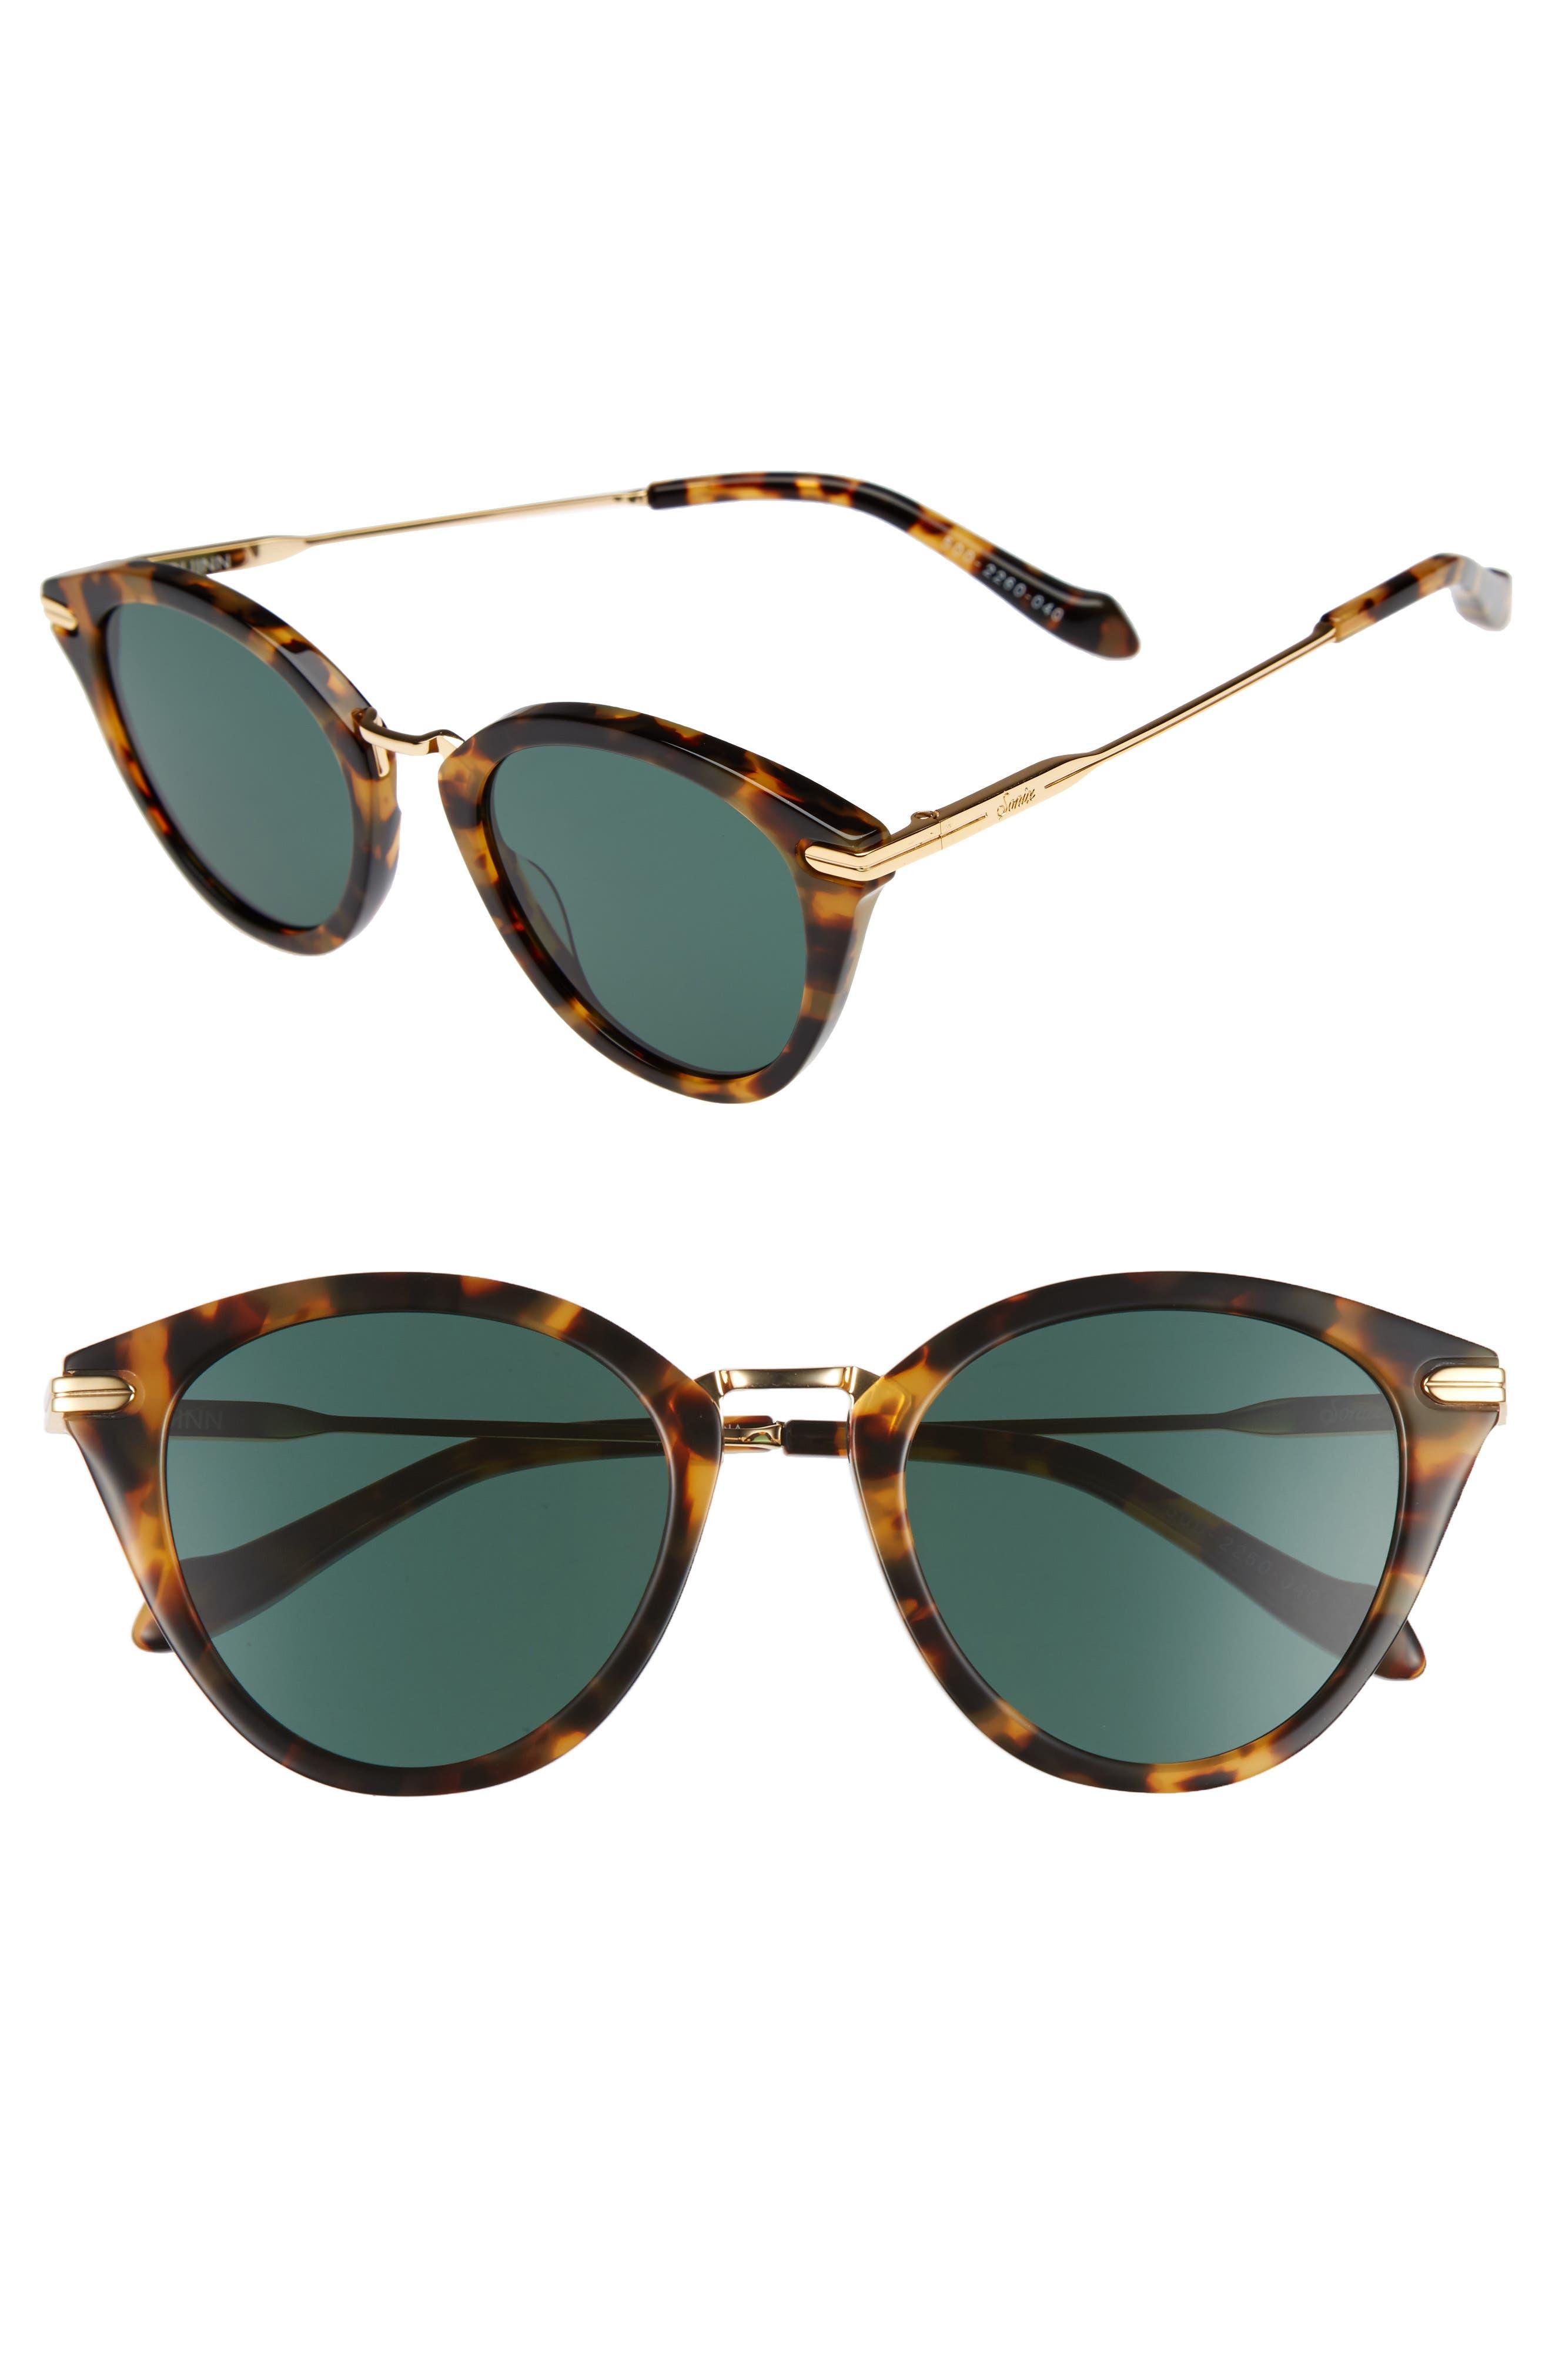 Sonix Quinn 48mm Cat Eye Sunglasses